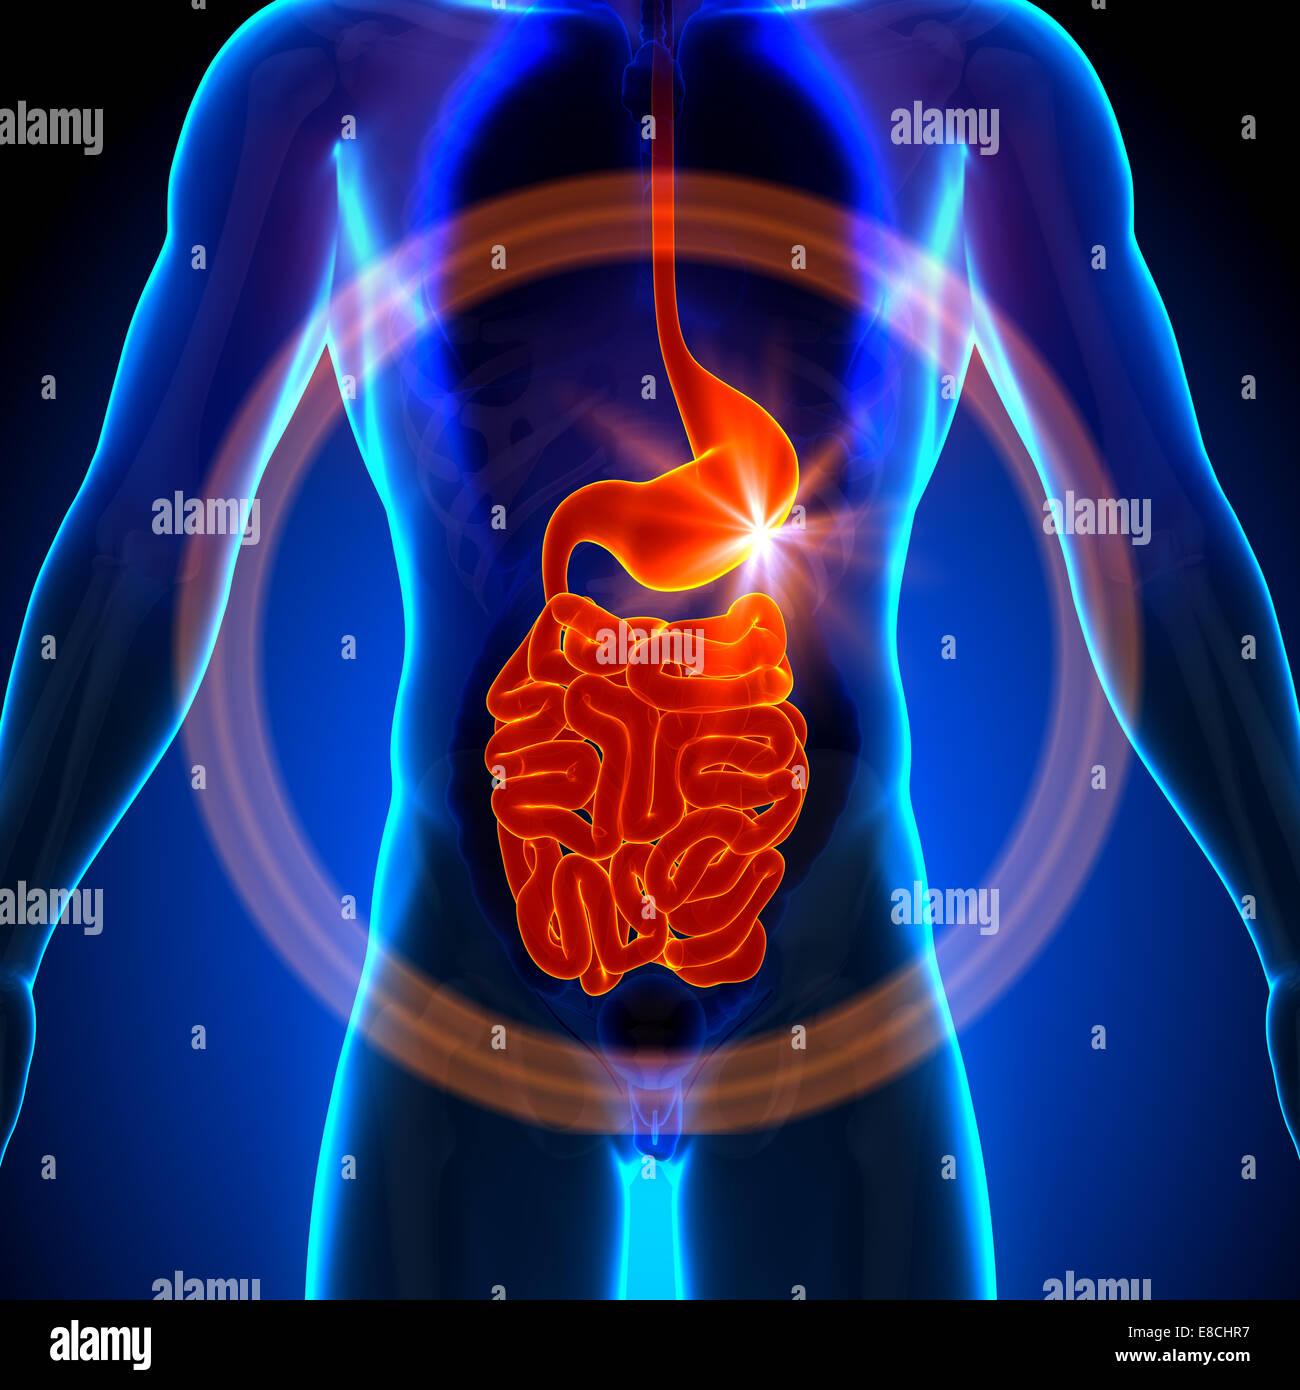 Stomach / Guts / Small Intestine - Male anatomy of human organs ...